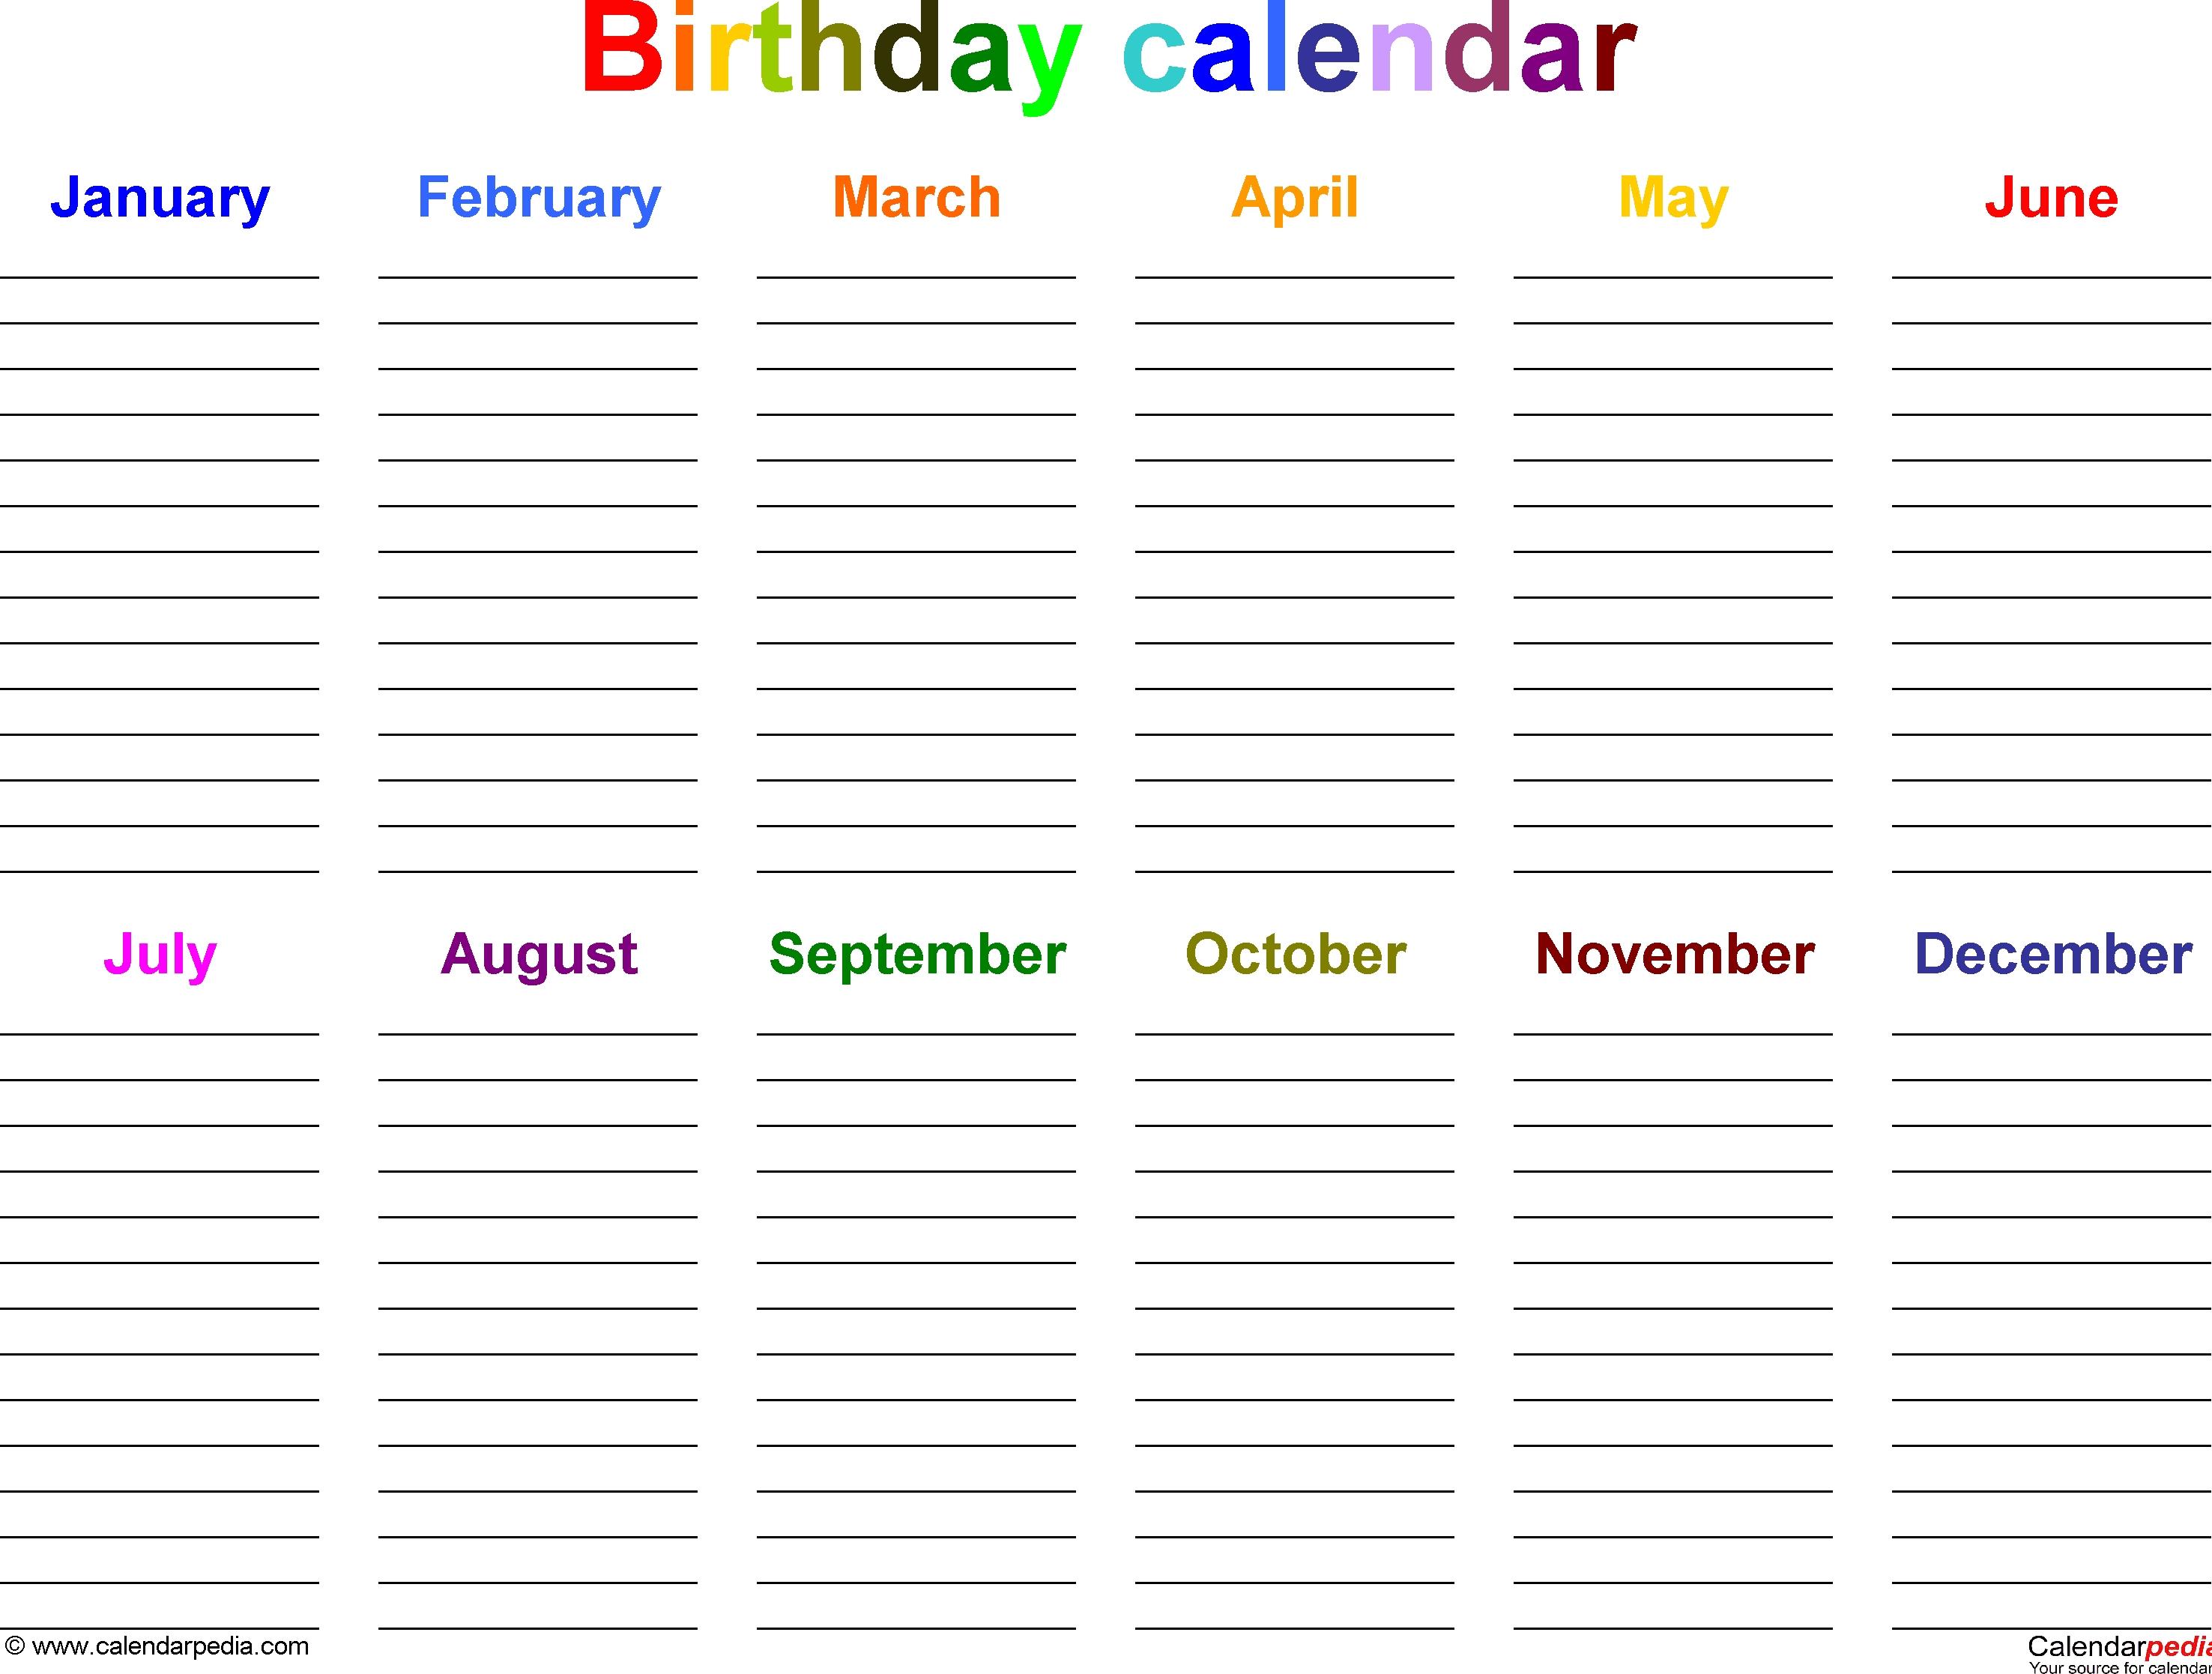 The Best Printable Birthday Calendar Template - Mitchell Blog